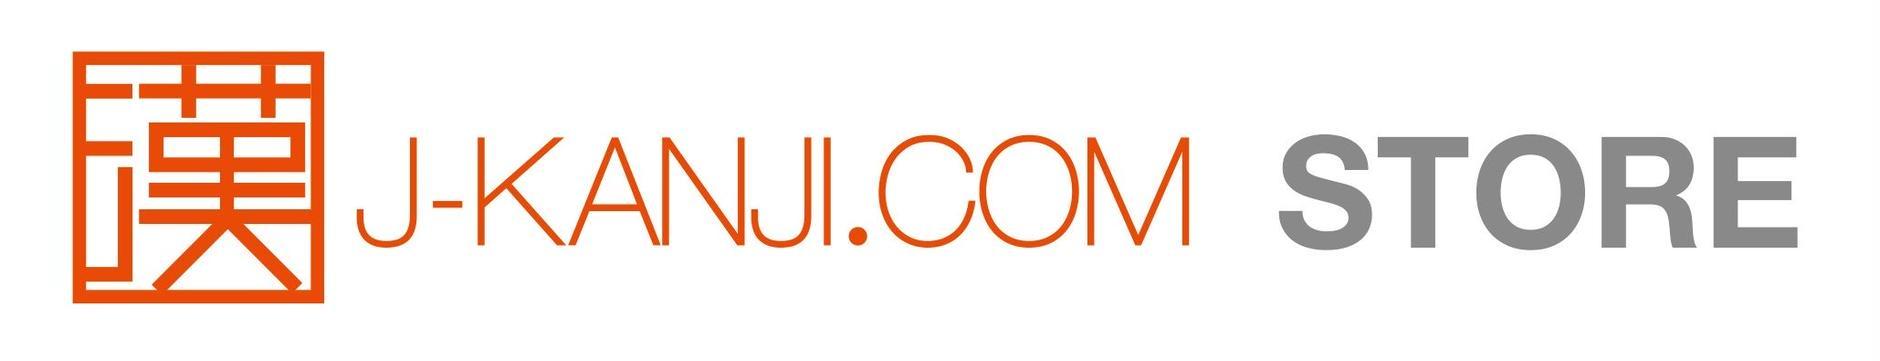 J-KANJI.com store